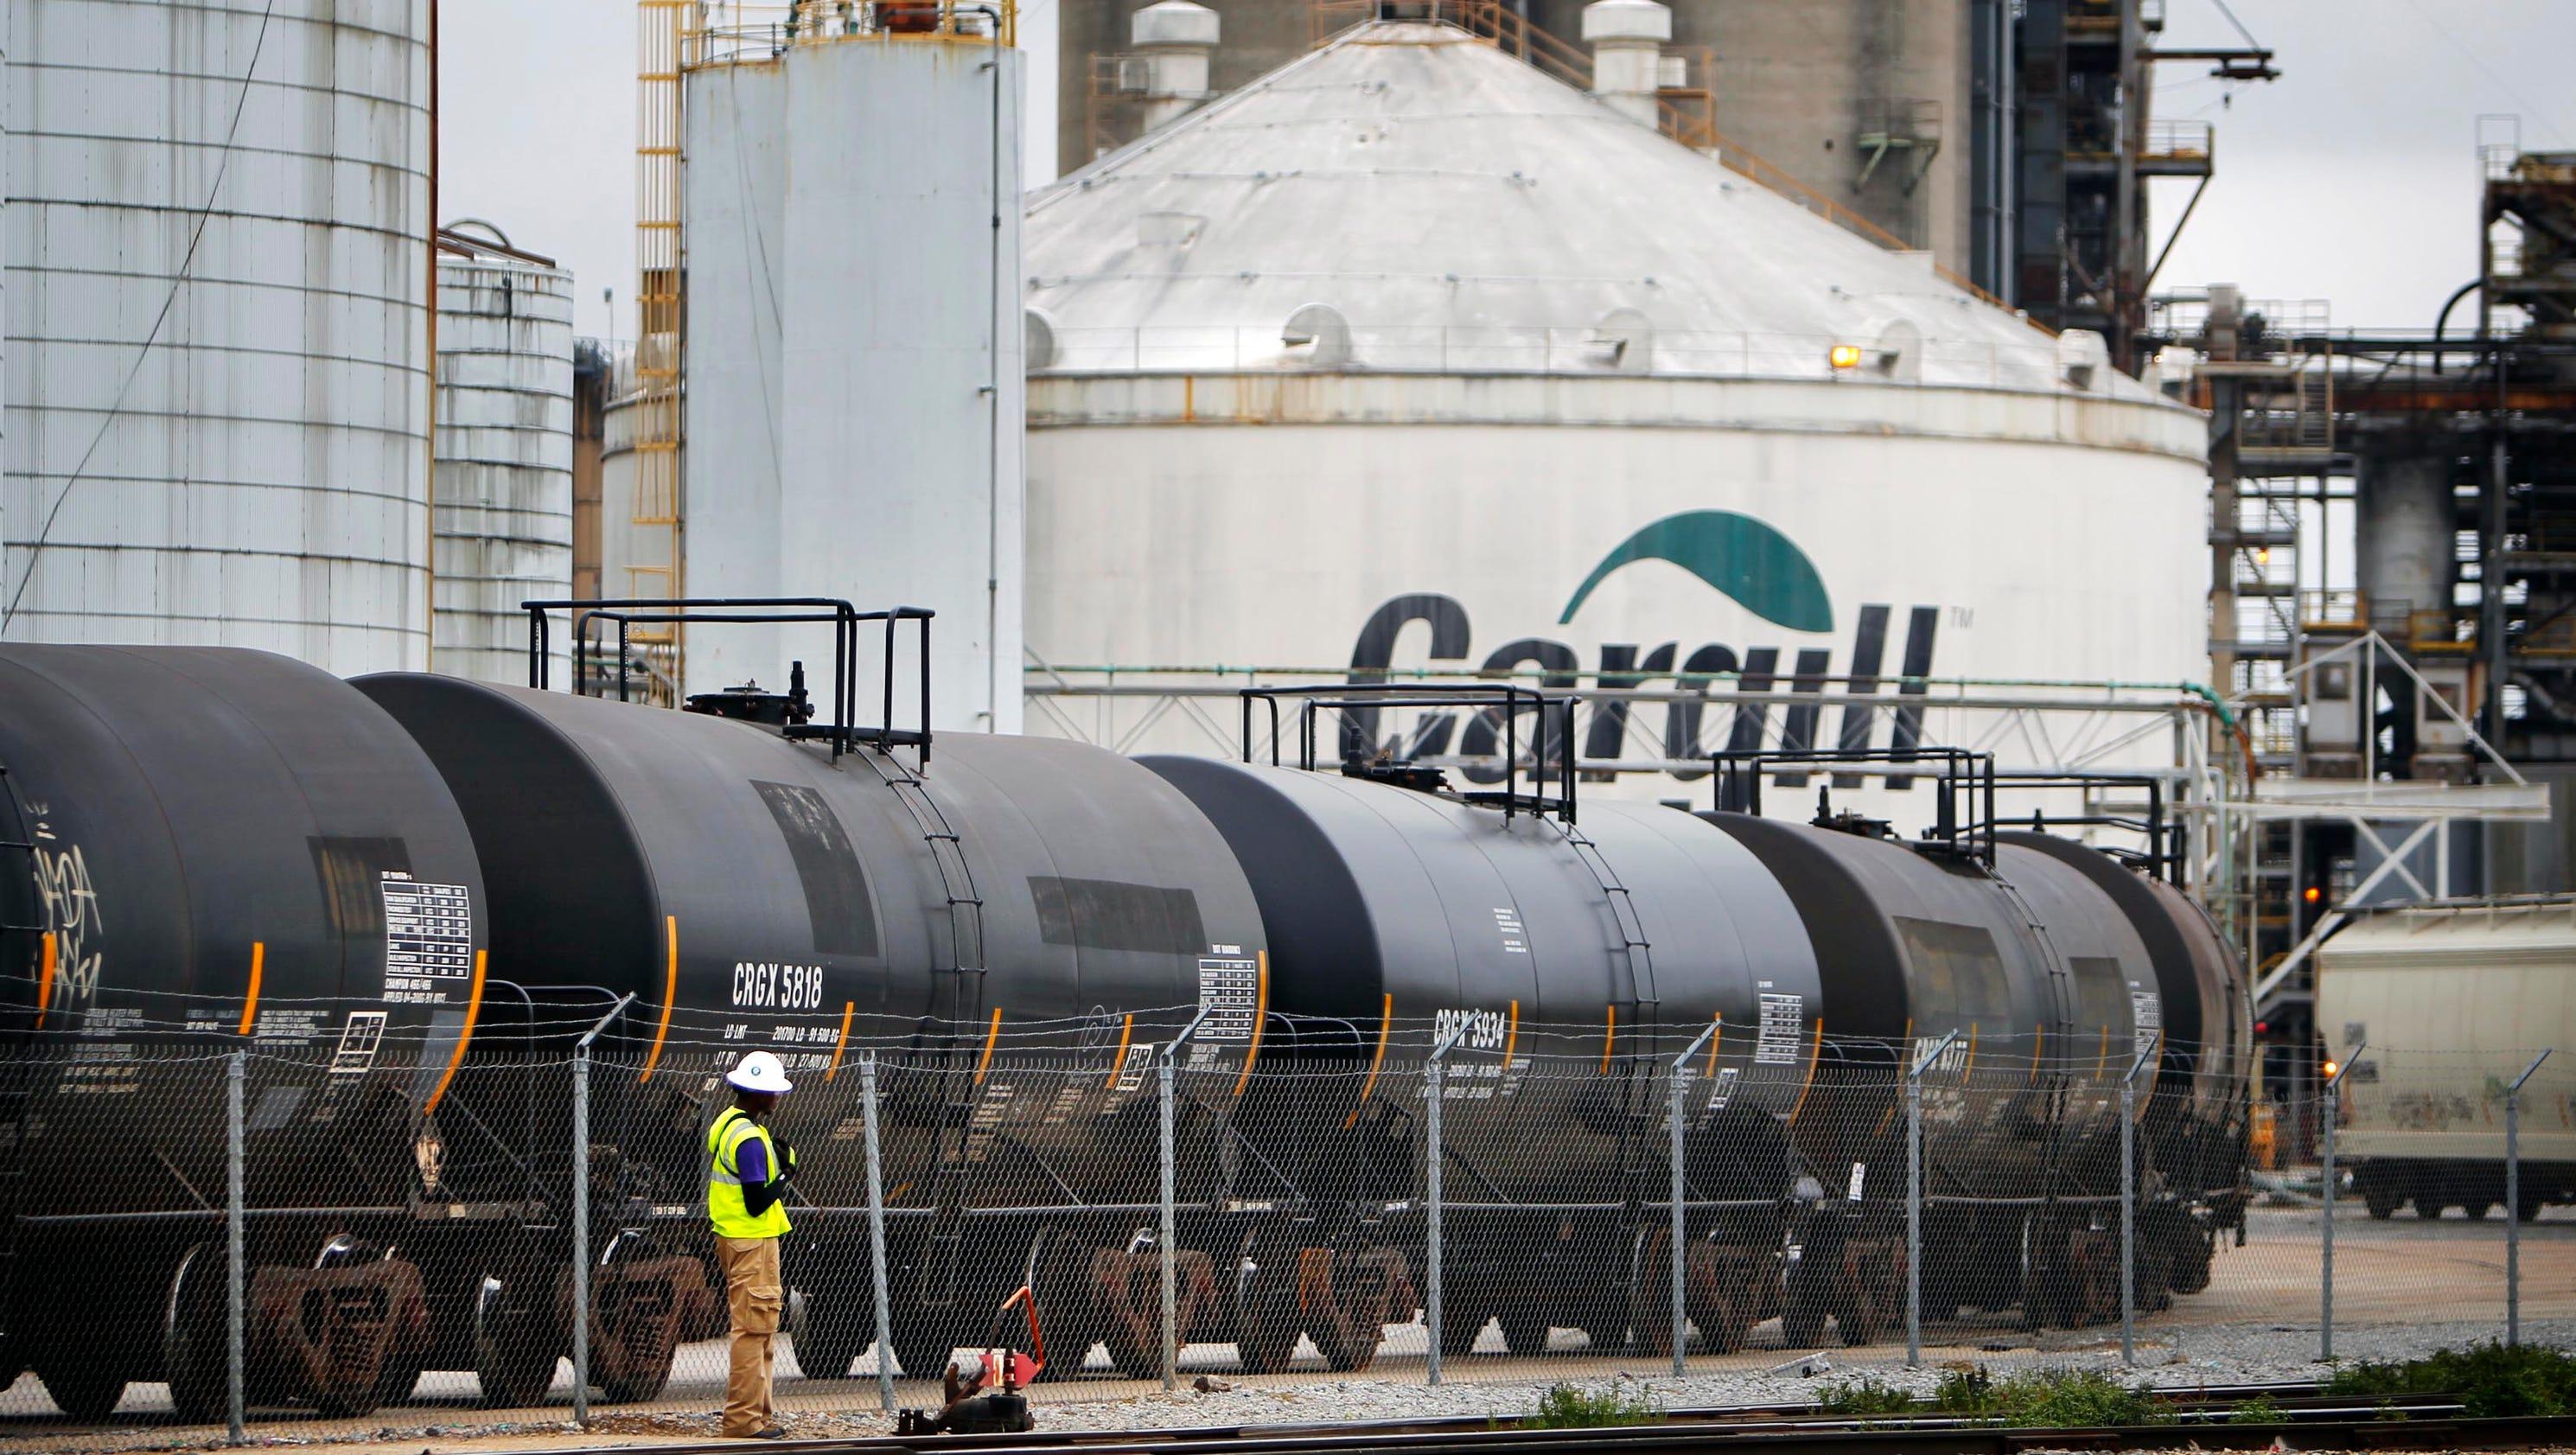 Cargill calysta to open fish food factory in memphis for Fishing in memphis